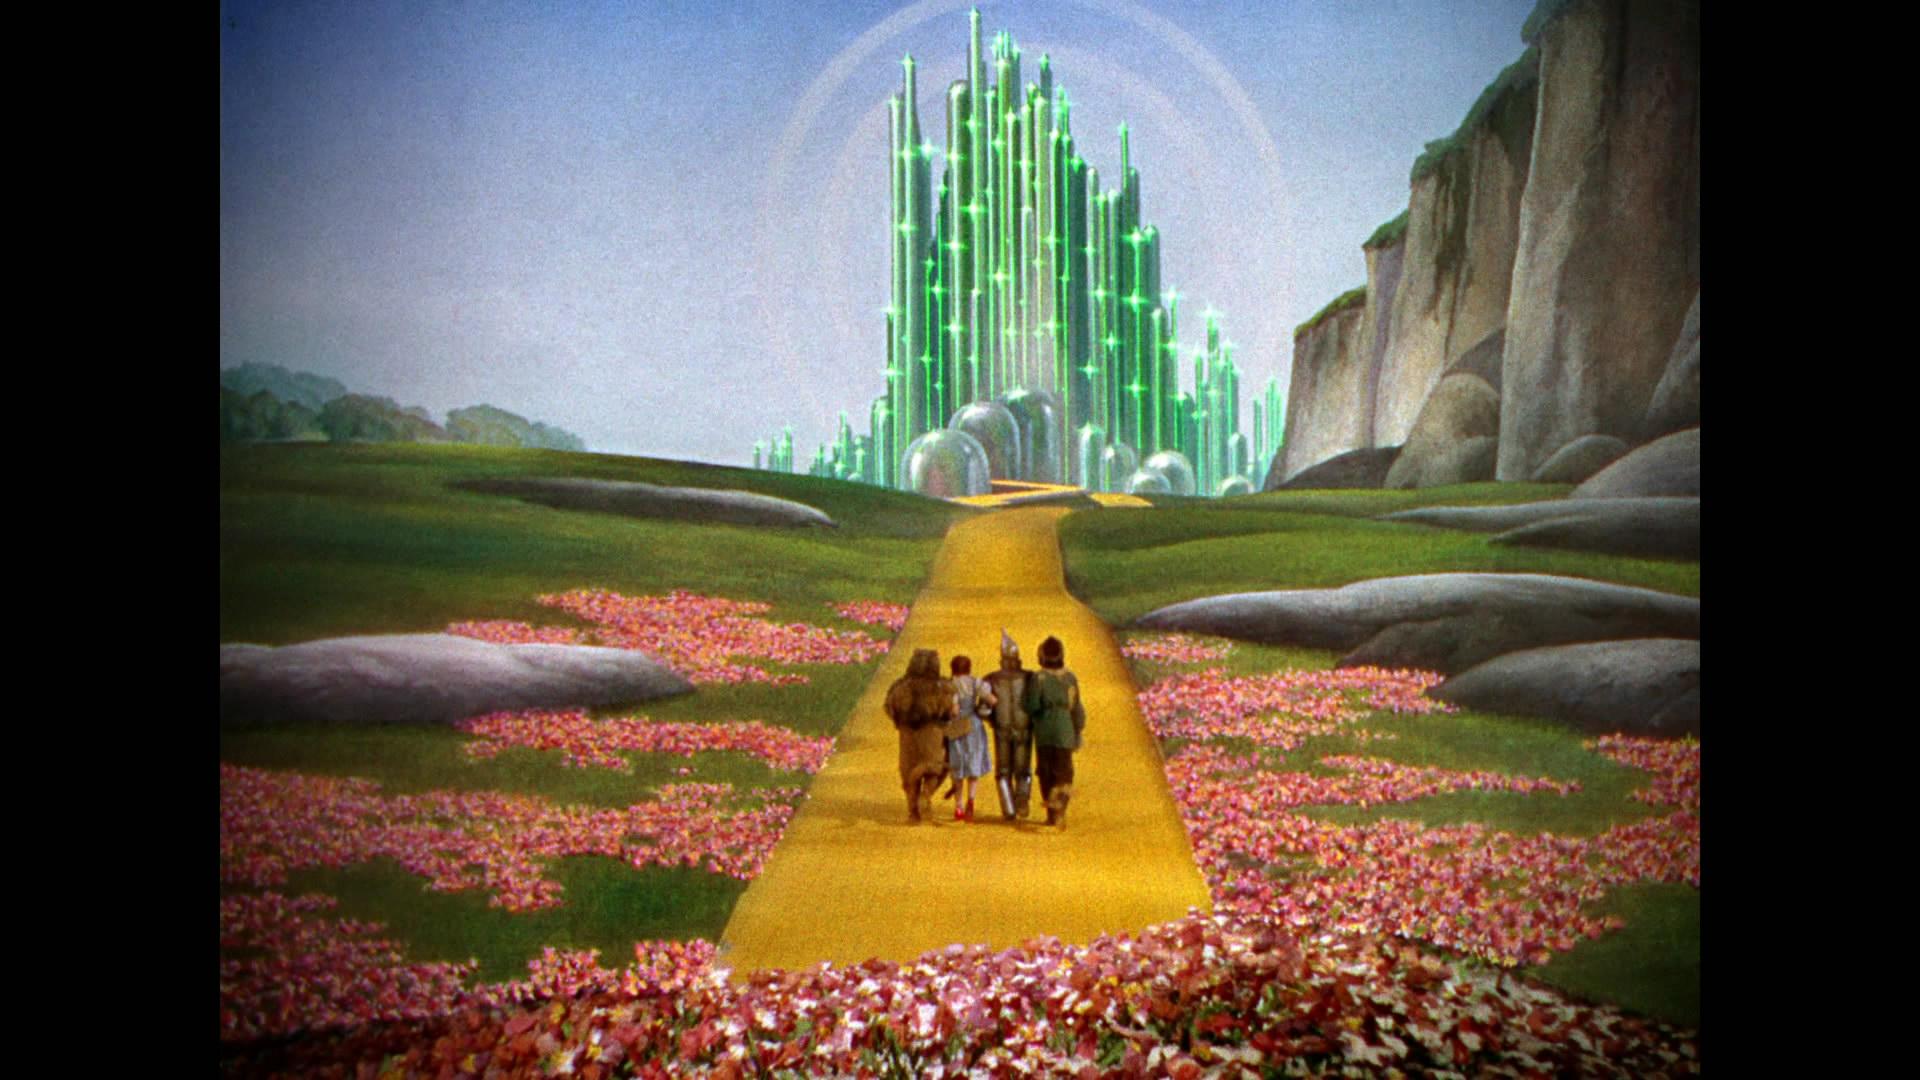 Green curtain oz - Wizardofoz5740